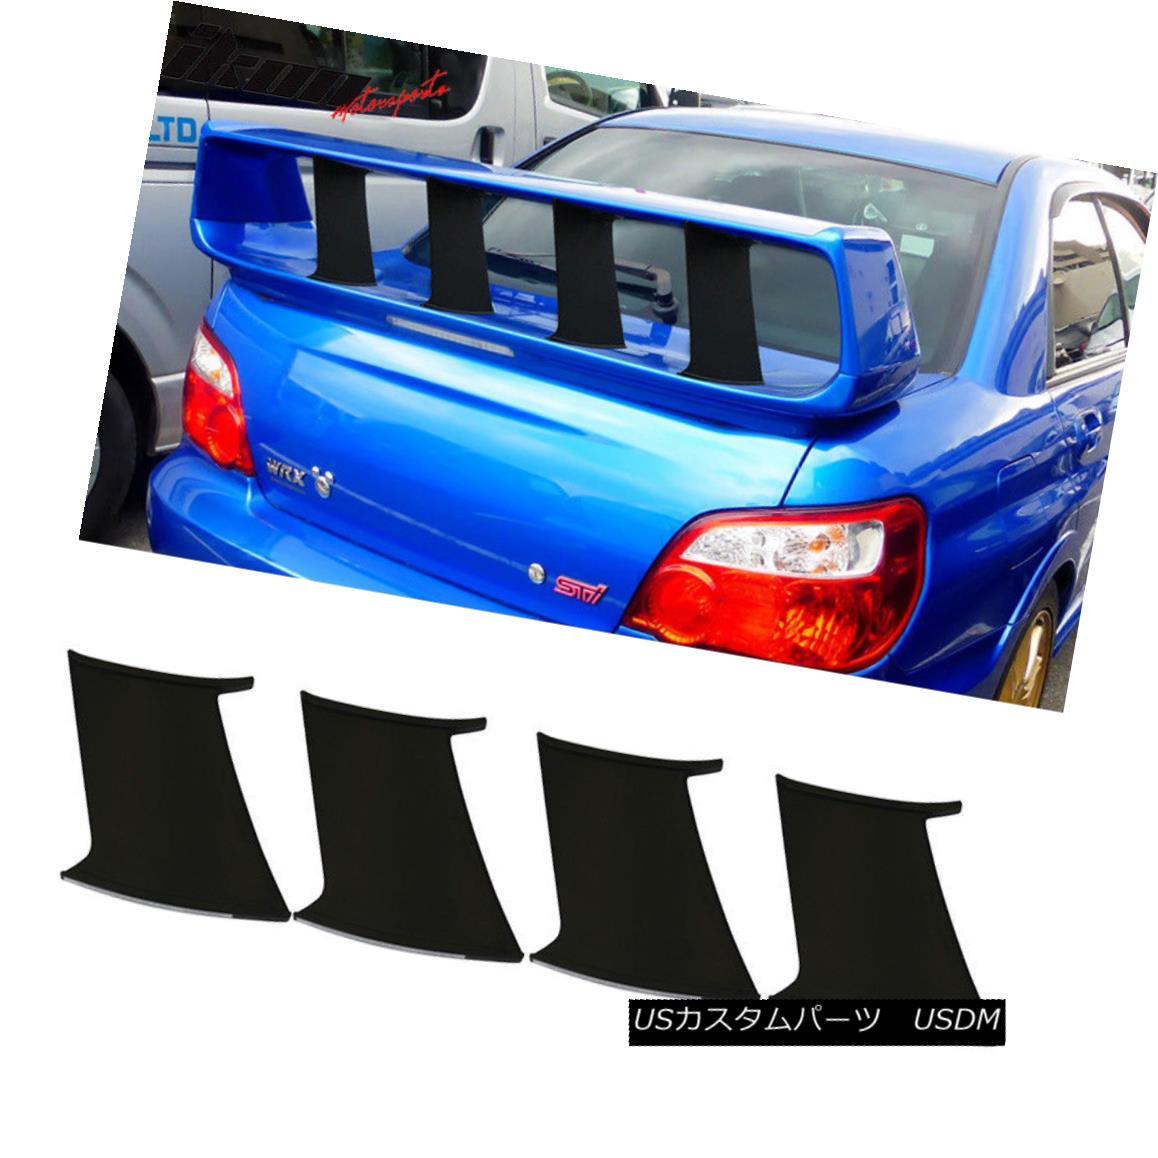 Fits 06-11 Civic Performance Trunk Spoiler Painted #B537M Atomic Blue Metallic